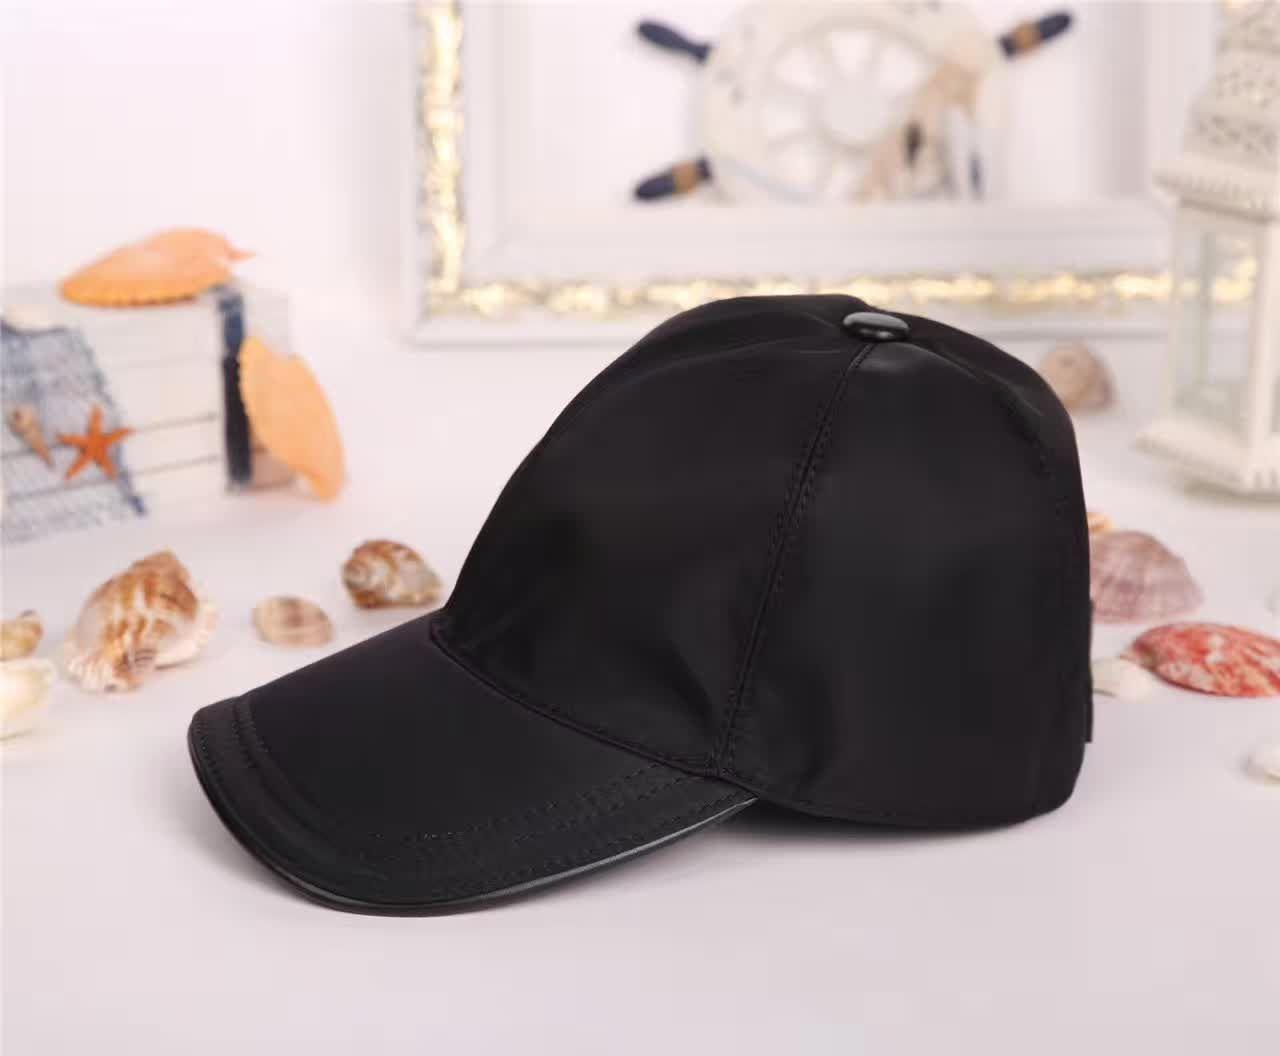 2018 Fashion Men's Ball Caps High Quality European Style Hats Sun Hat Four Colors Optional Baseball Cap